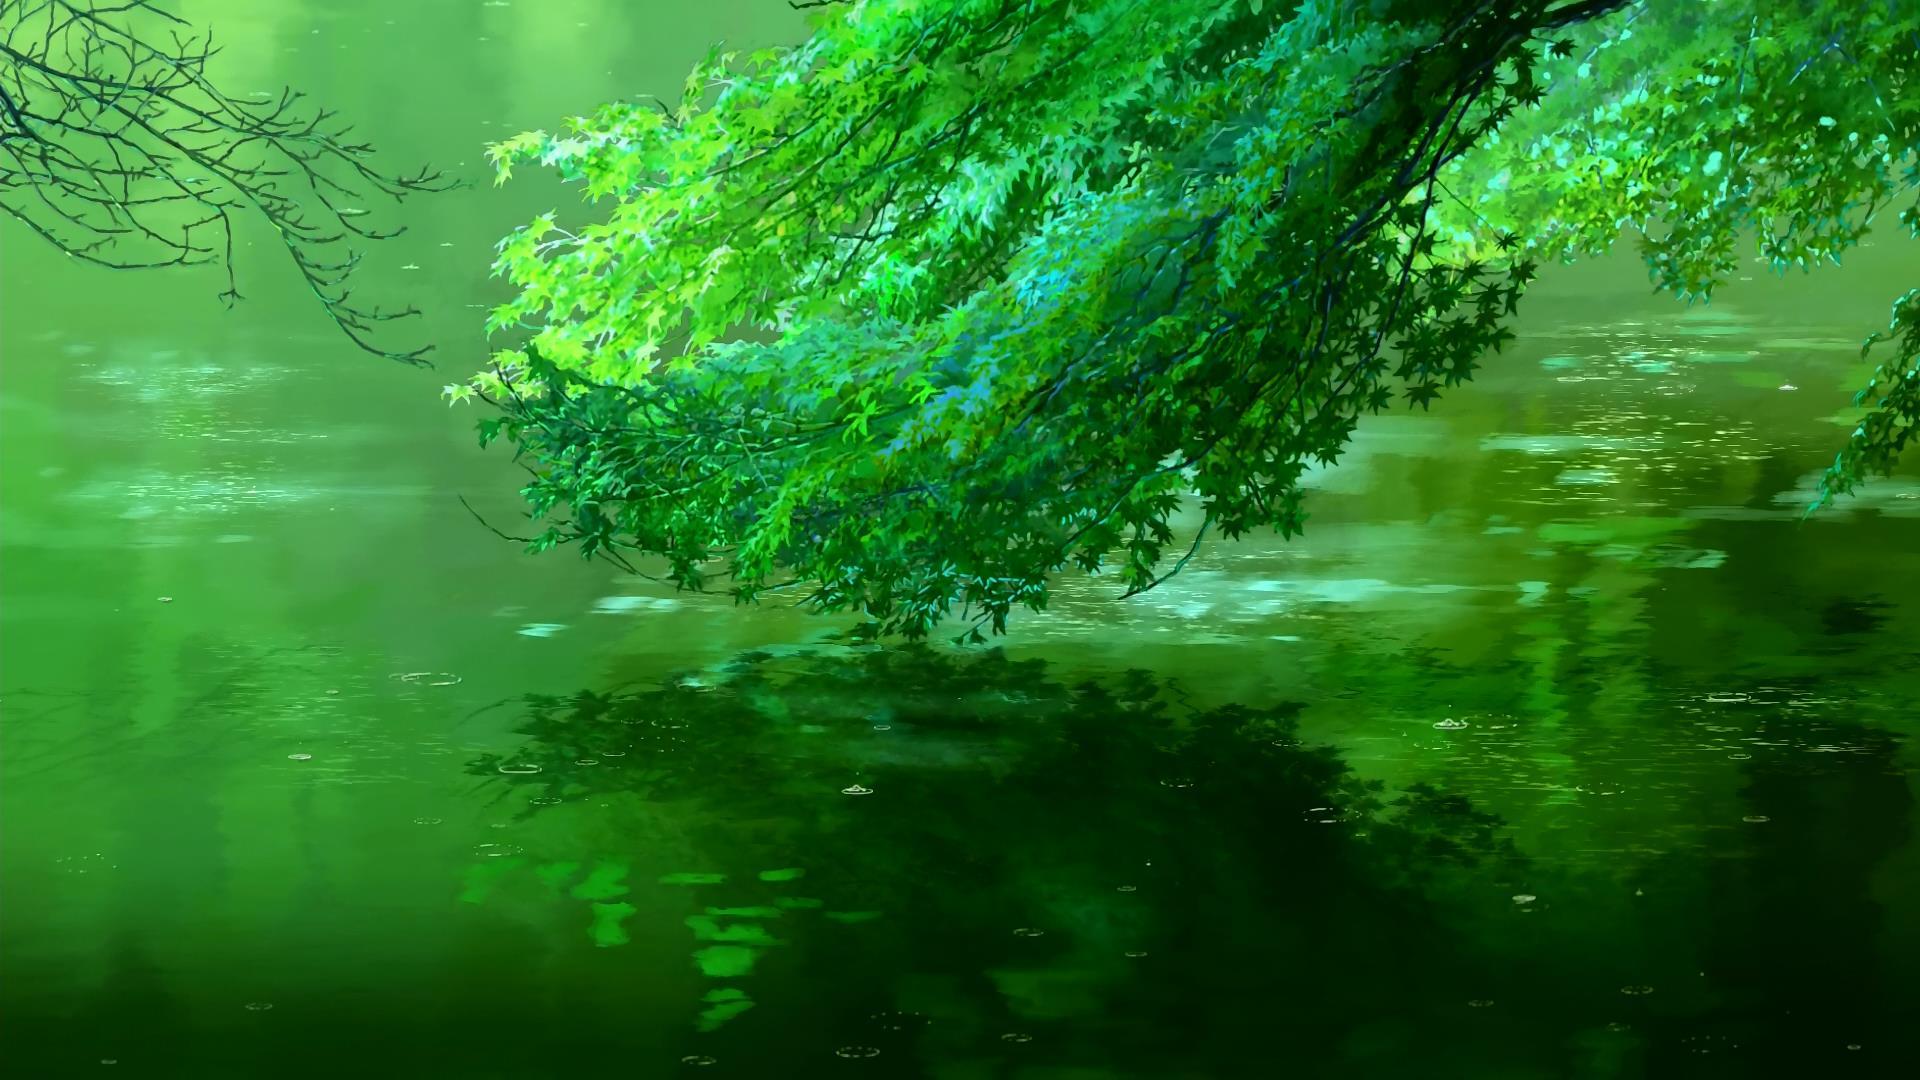 Garden Of Words Backgrounds , HD Wallpaper & Backgrounds